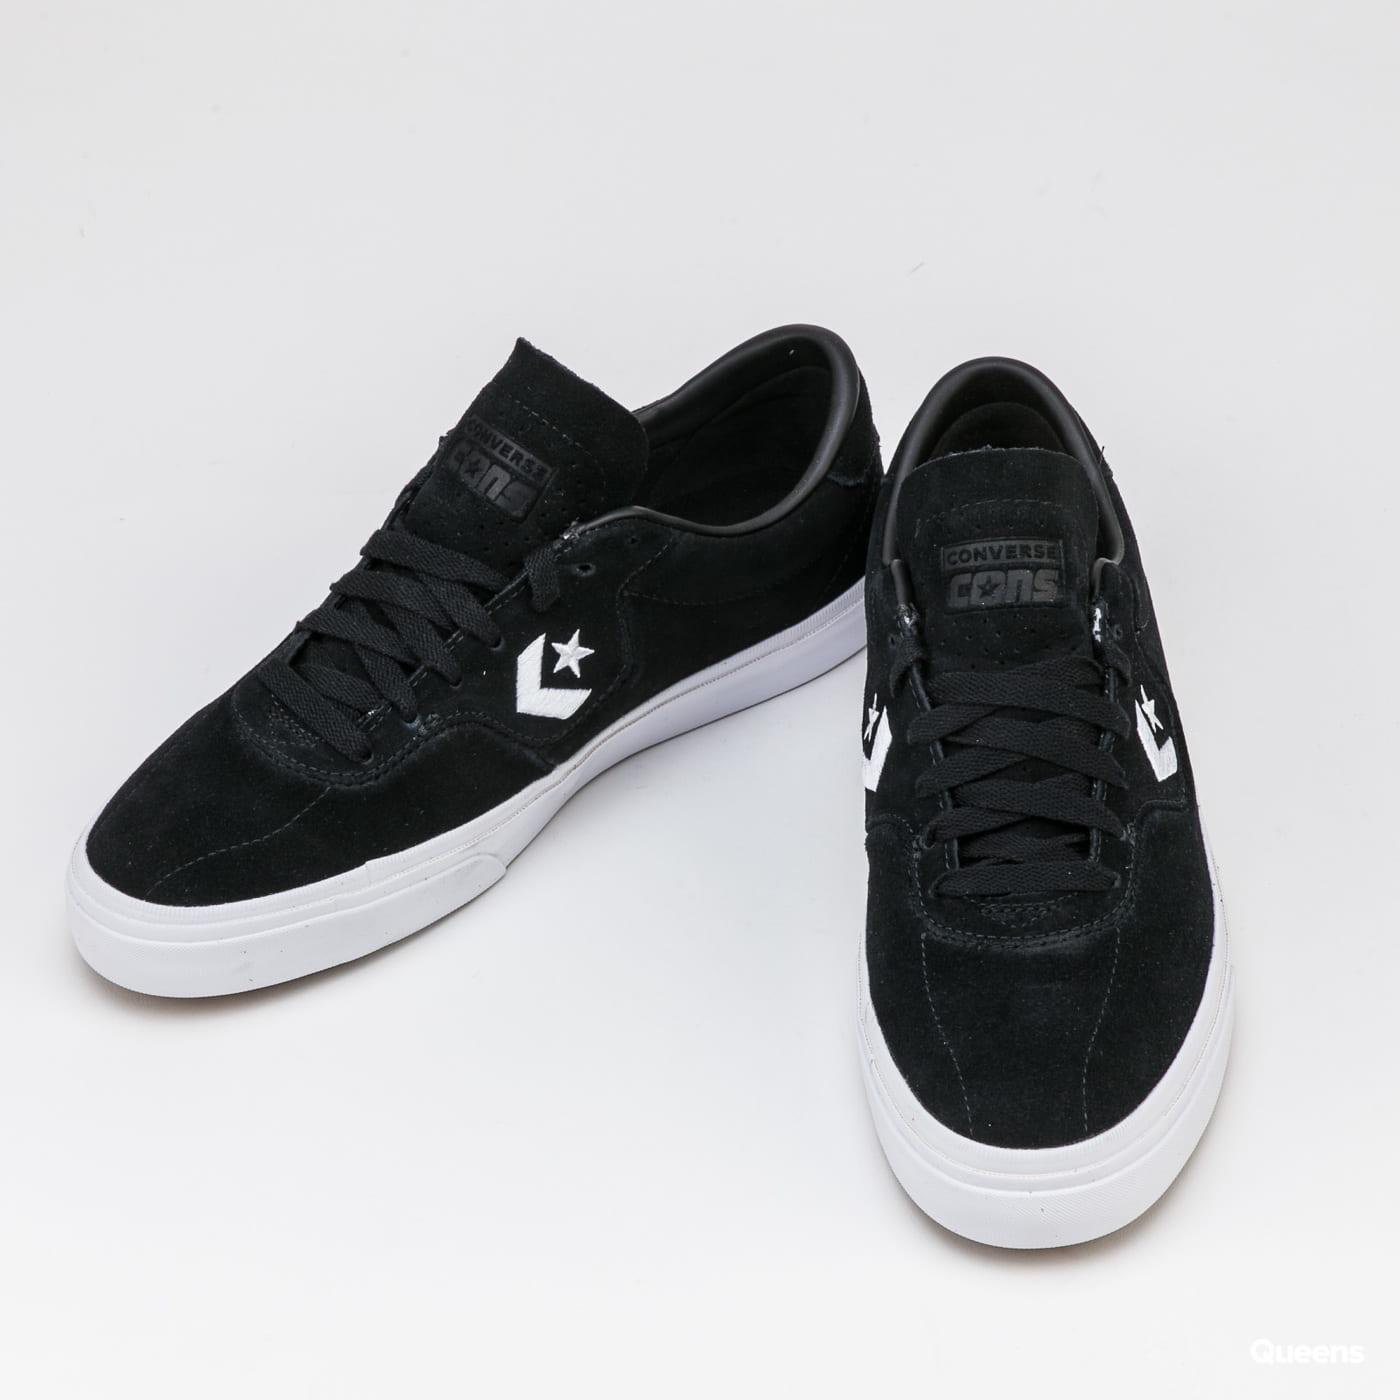 Converse Louie Lopez Pro OX black / black / white